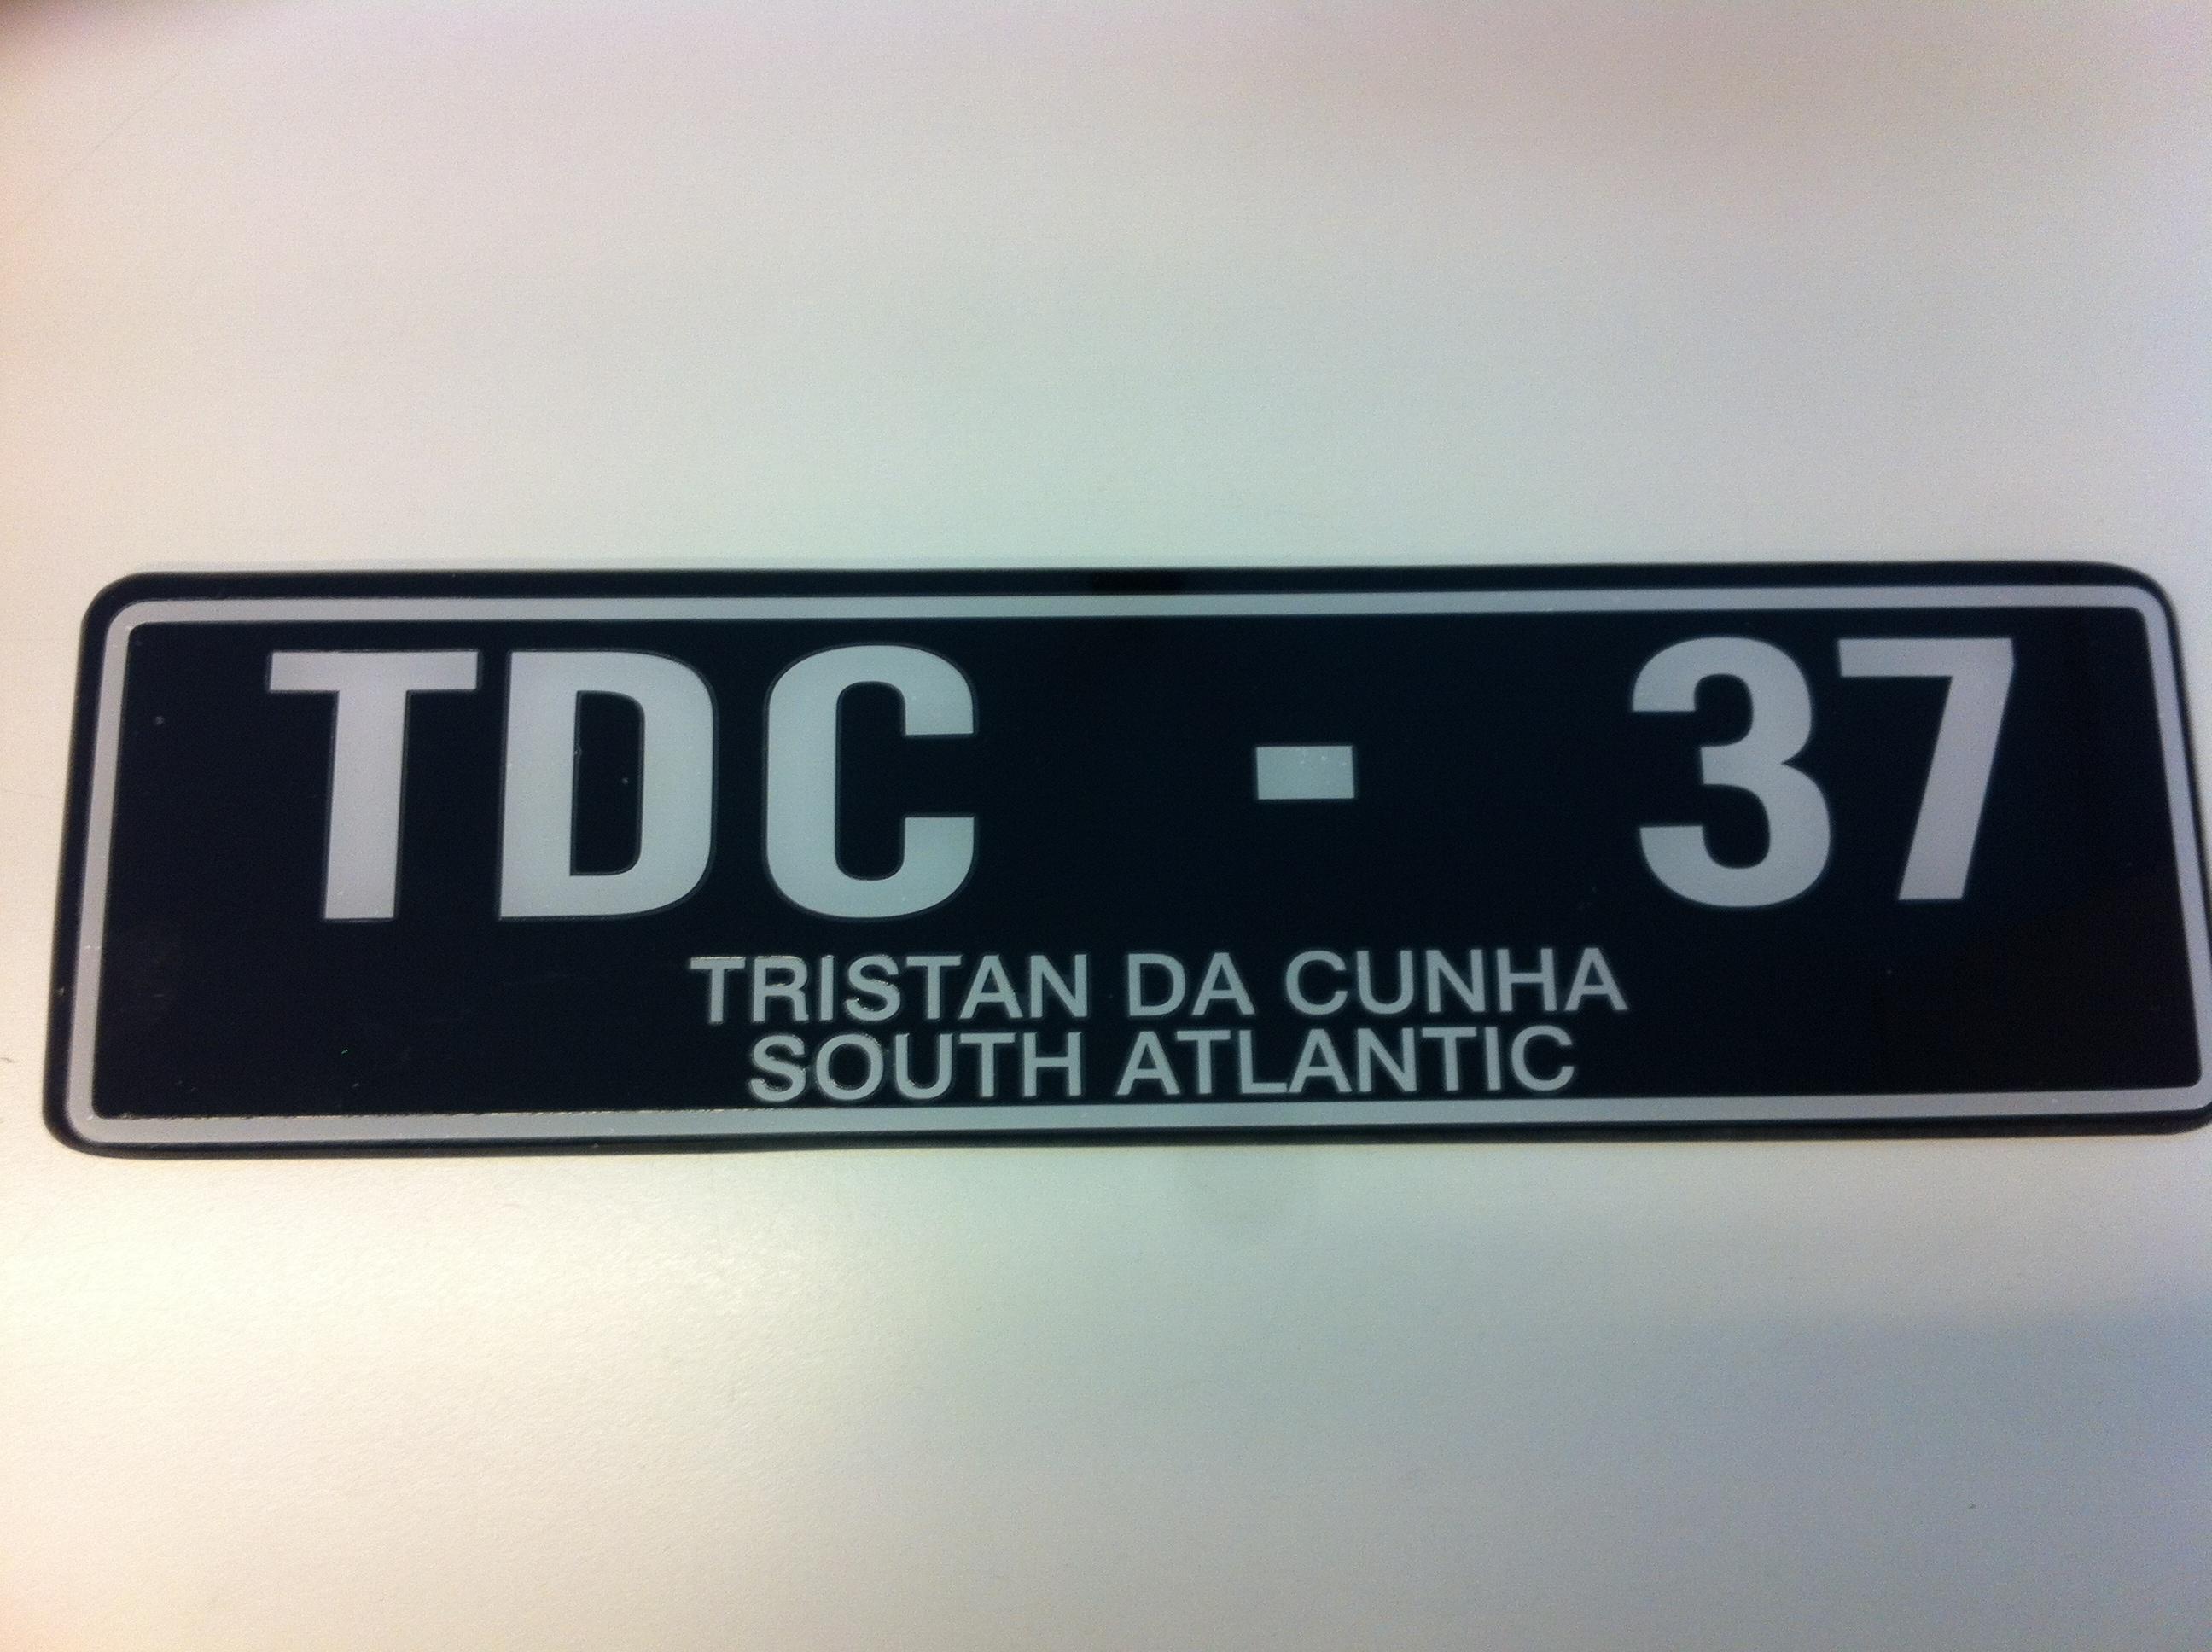 enrico gasperi_ car number plate (original) Tristan da Cunha